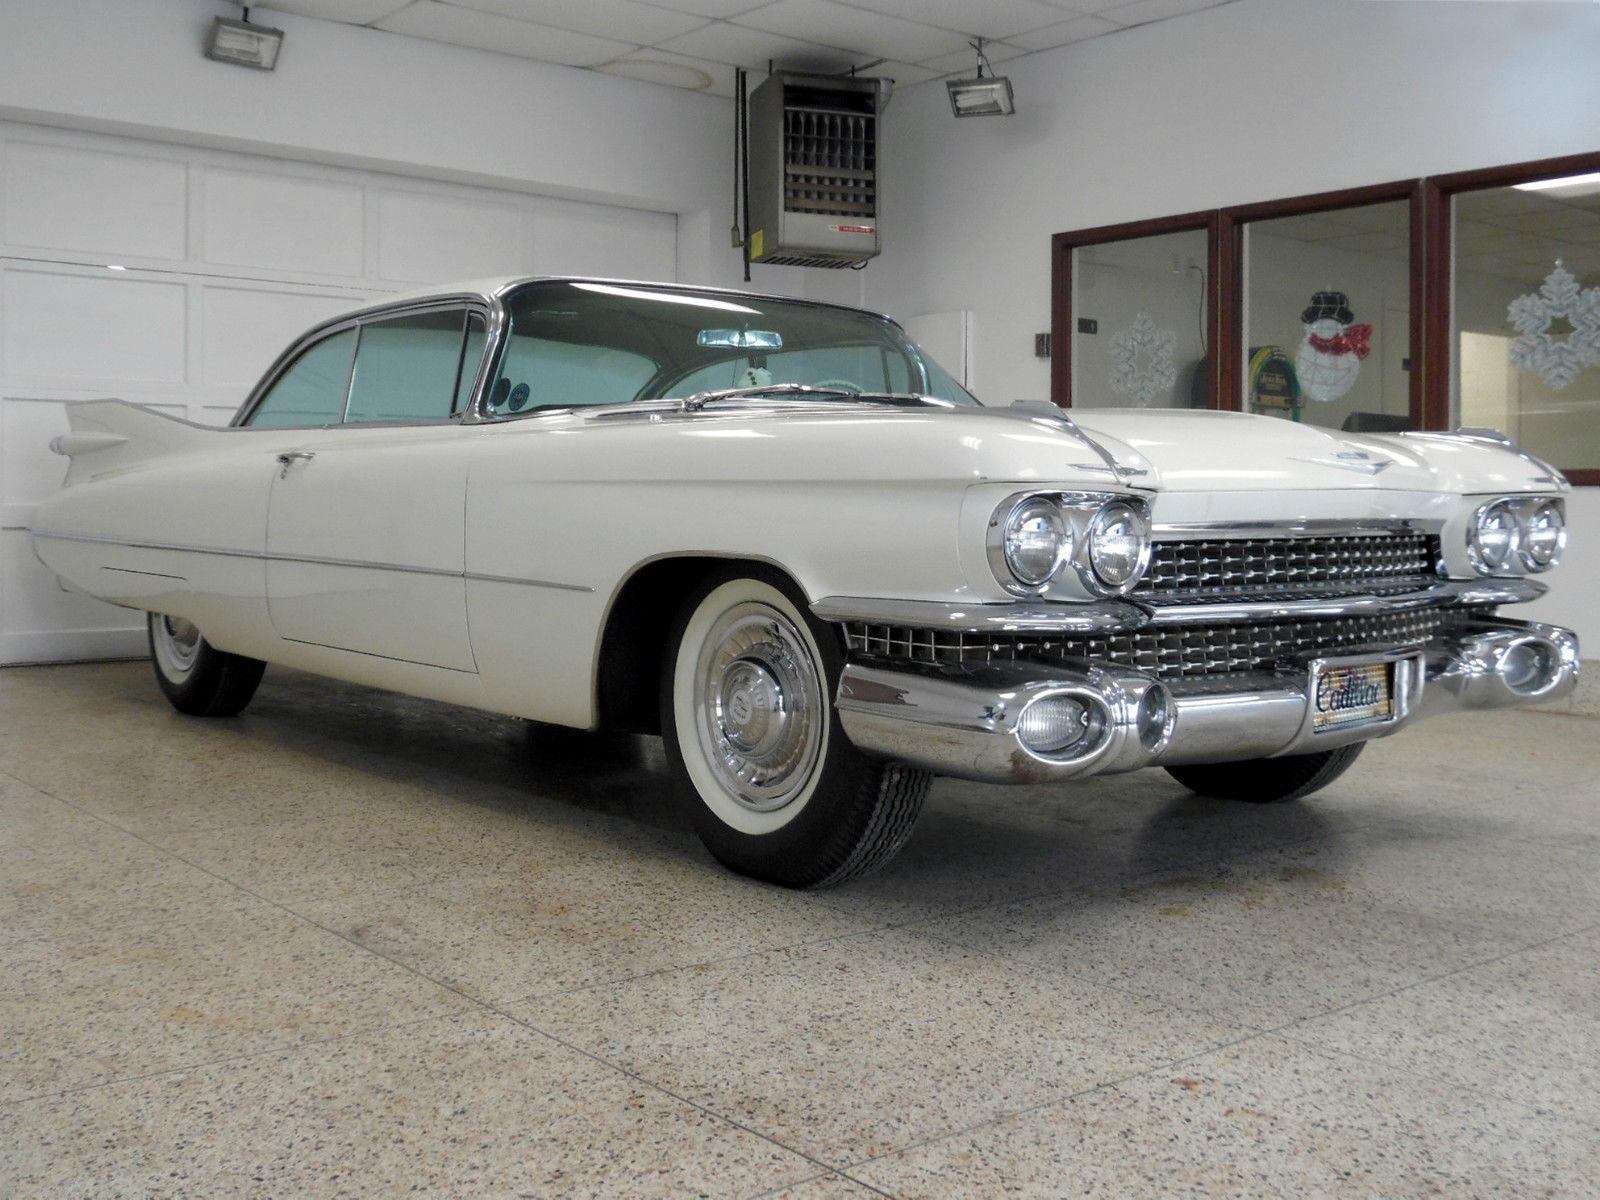 28 Images New 2 Door Cadillac Cadillac Door 1956